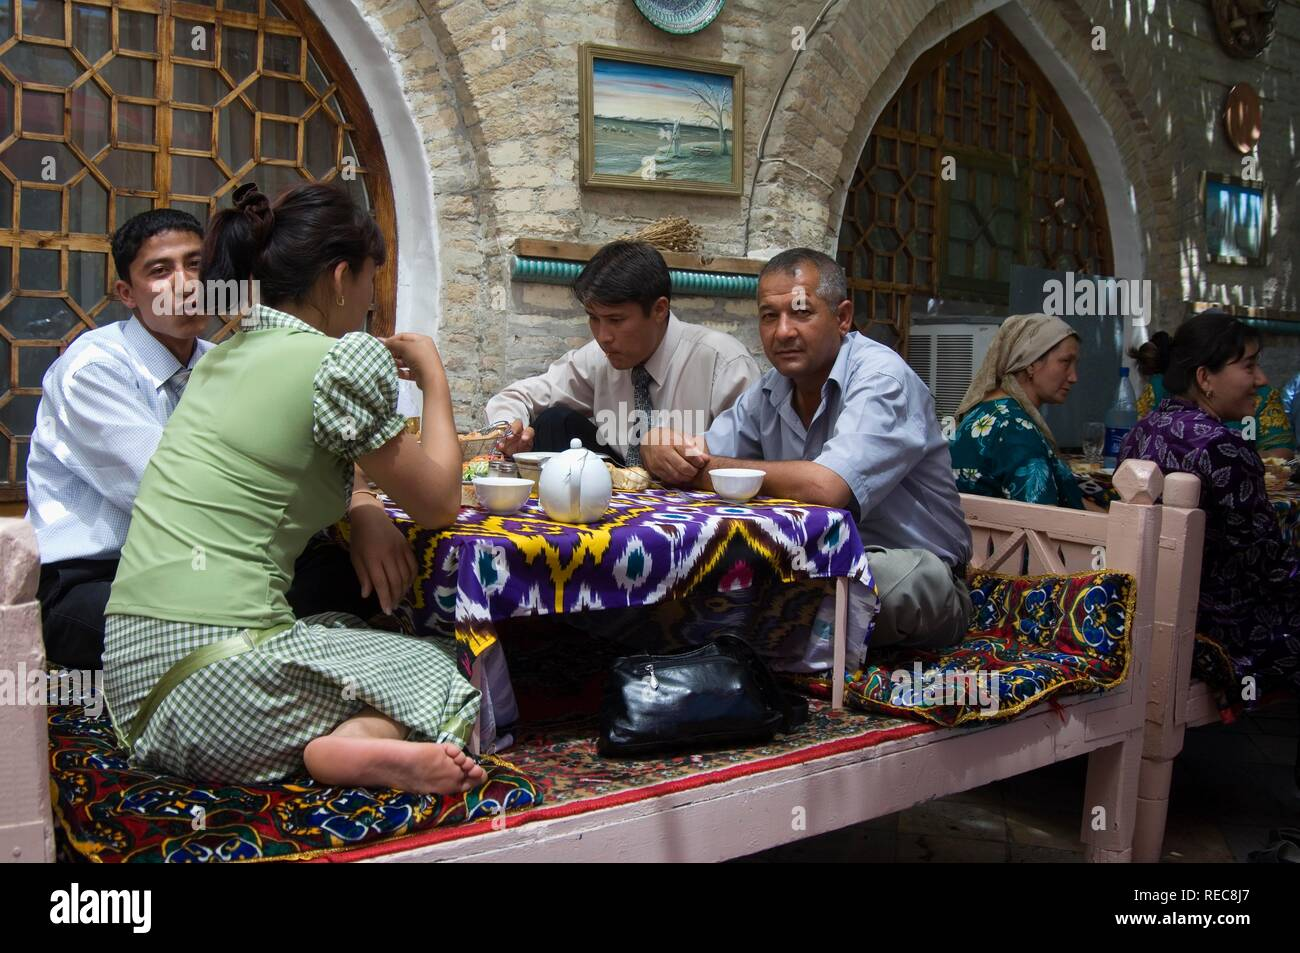 Uzbeks in a restaurant, Bukhara, Uzbekistan Stock Photo